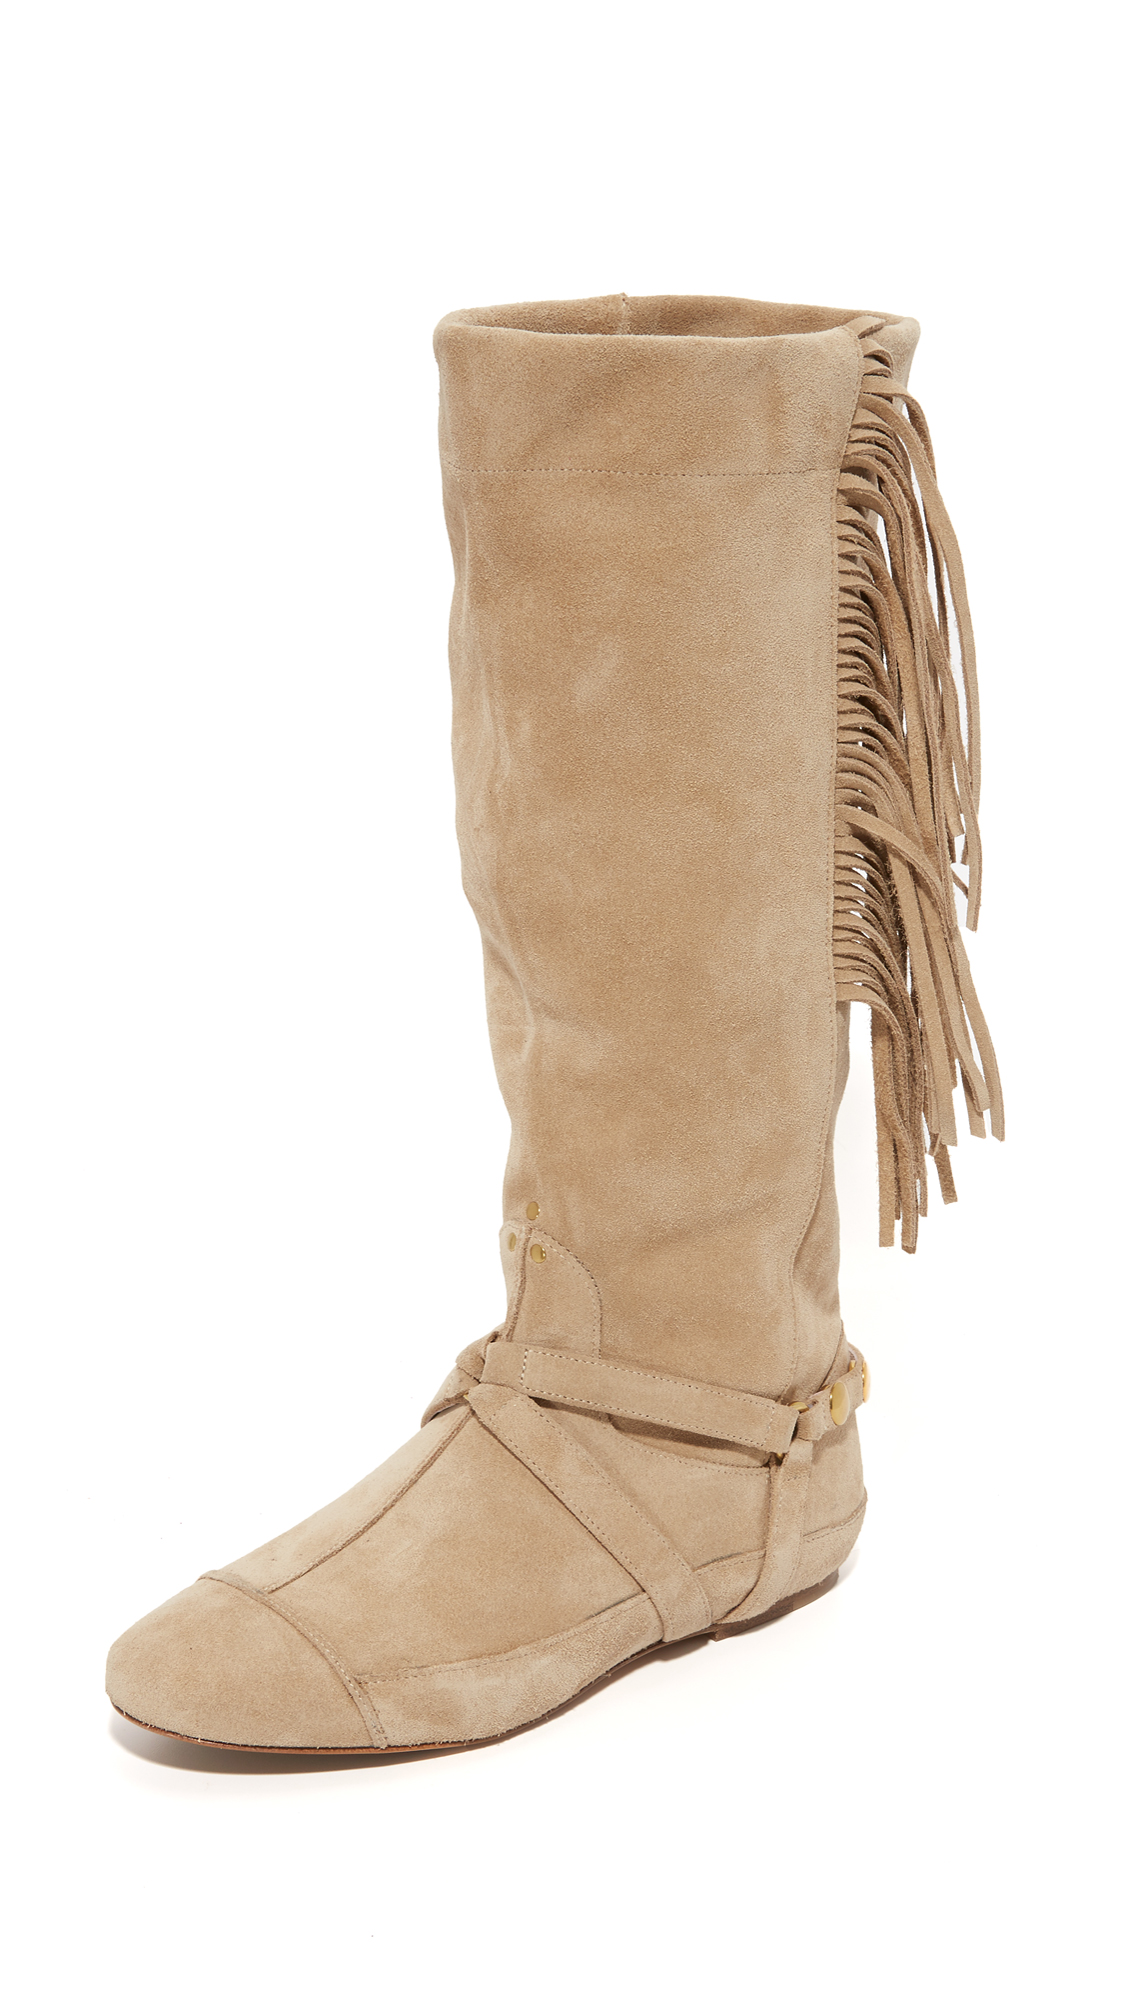 Jerome Dreyfuss Arizona Fringe Boots - Beige